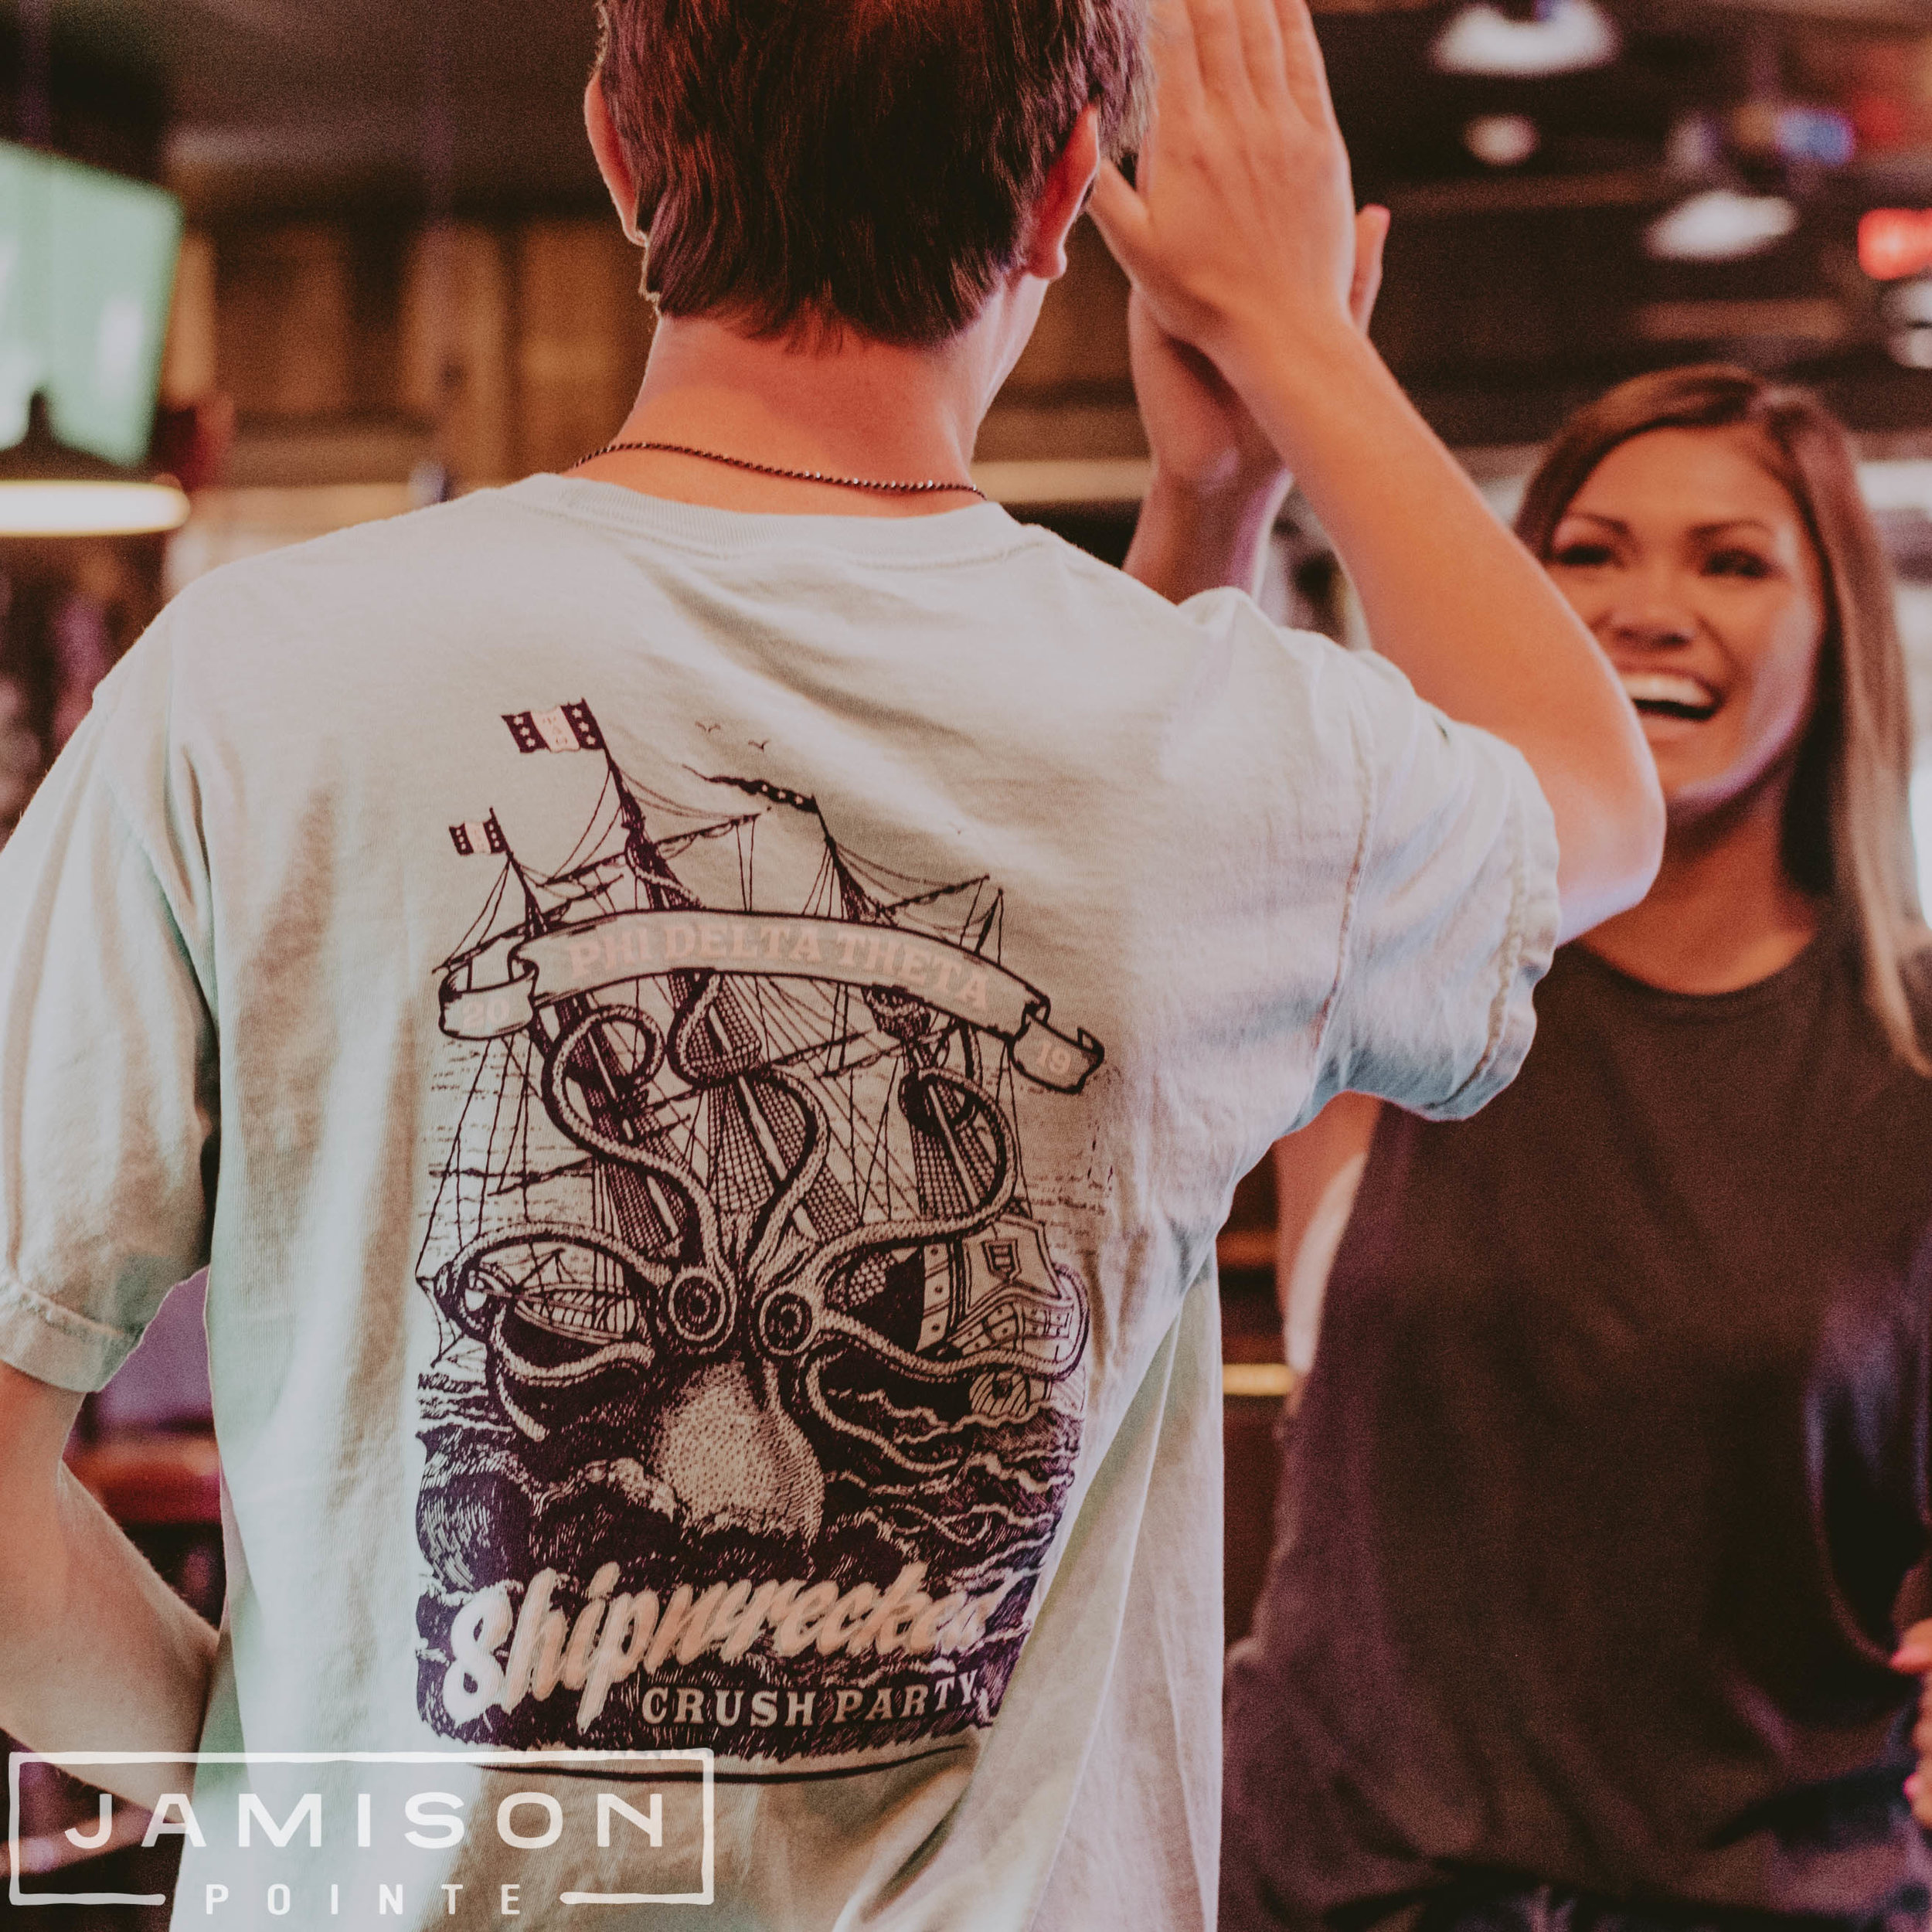 Phi Delta Theta Shipwrecked Tshirt